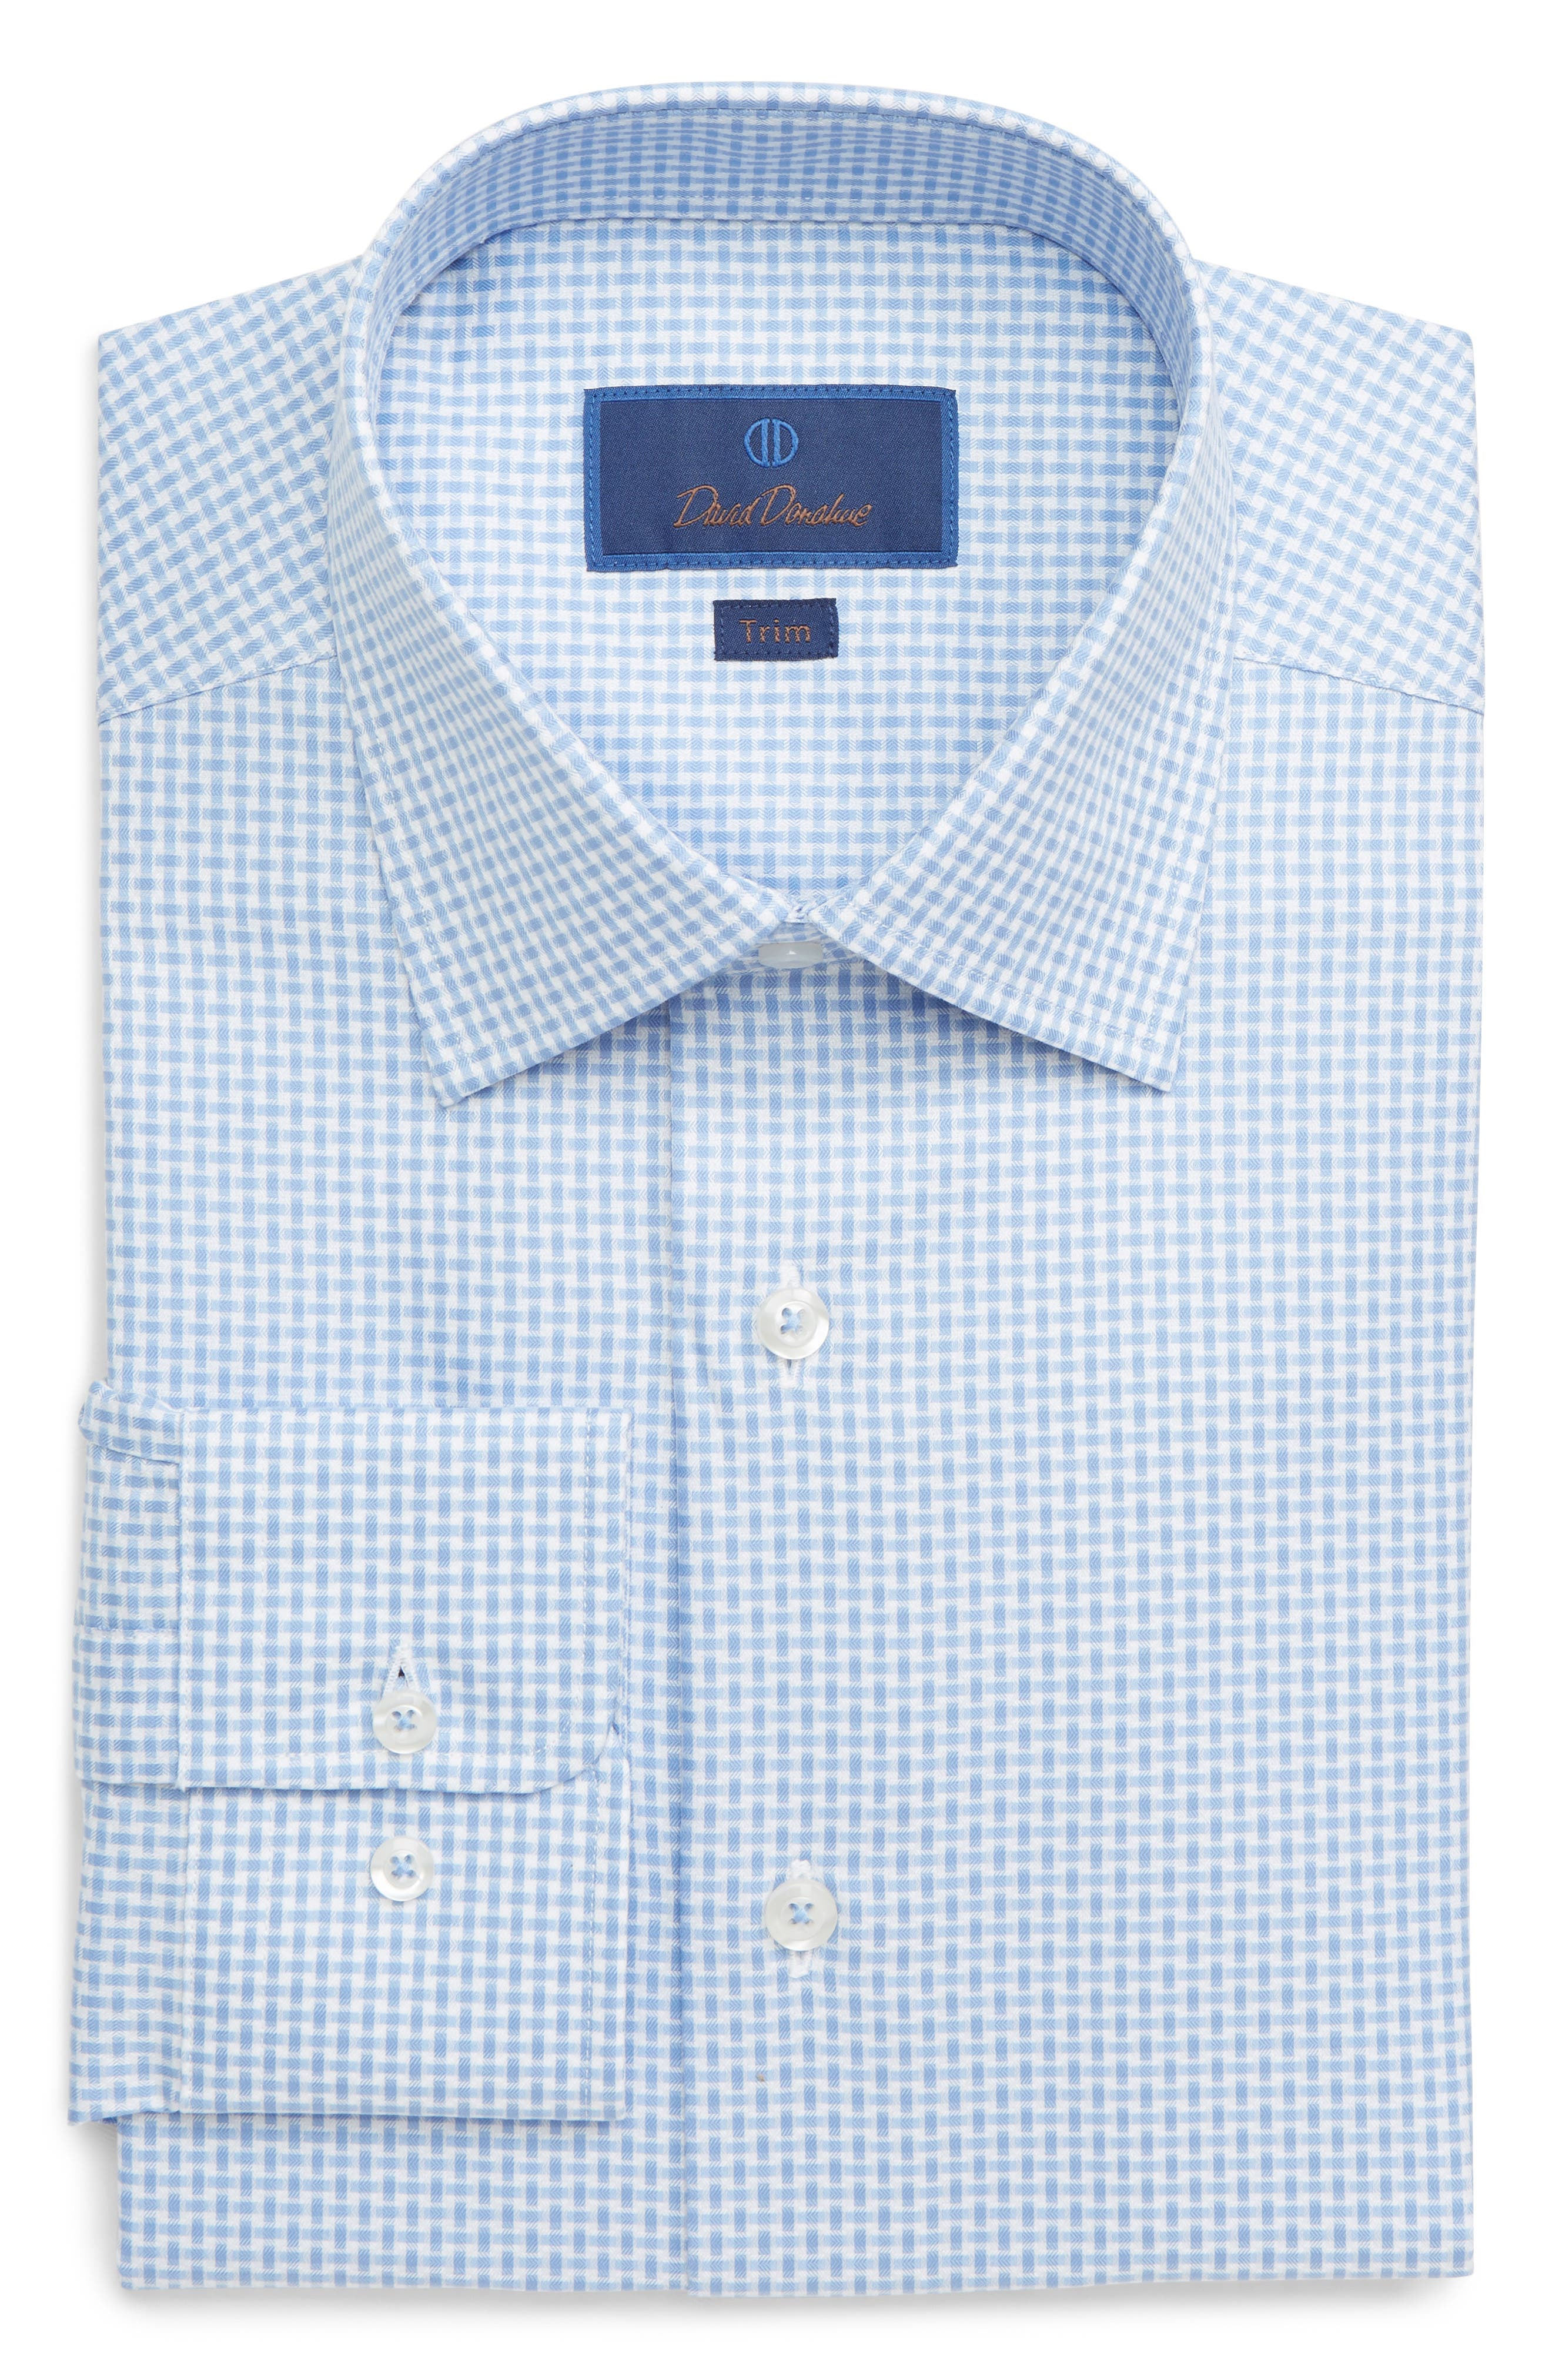 DAVID DONAHUE Trim Fit Print Dress Shirt, Main, color, BLUE